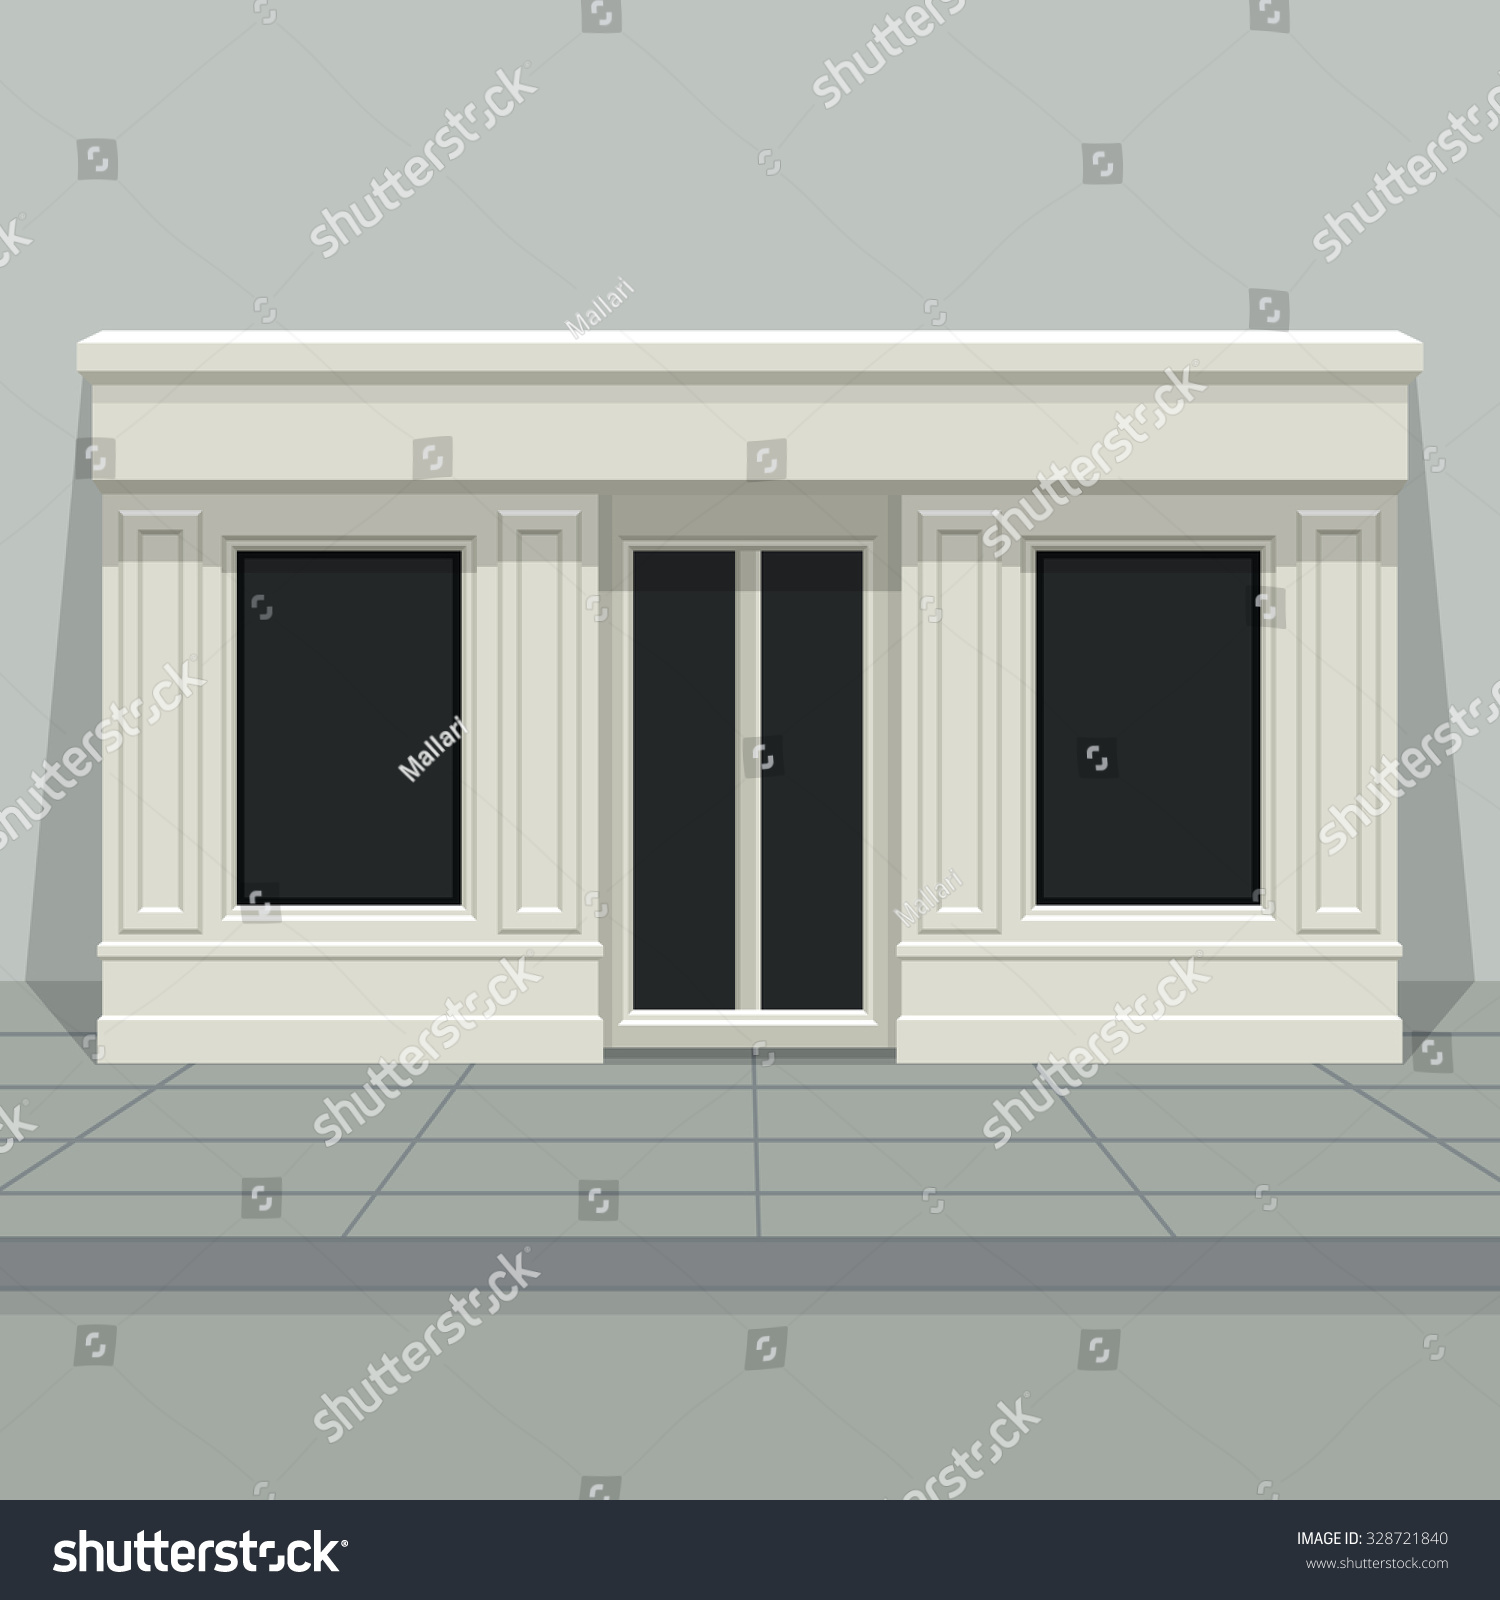 facade shop store boutique glass windows stock vector 328721840 shutterstock. Black Bedroom Furniture Sets. Home Design Ideas